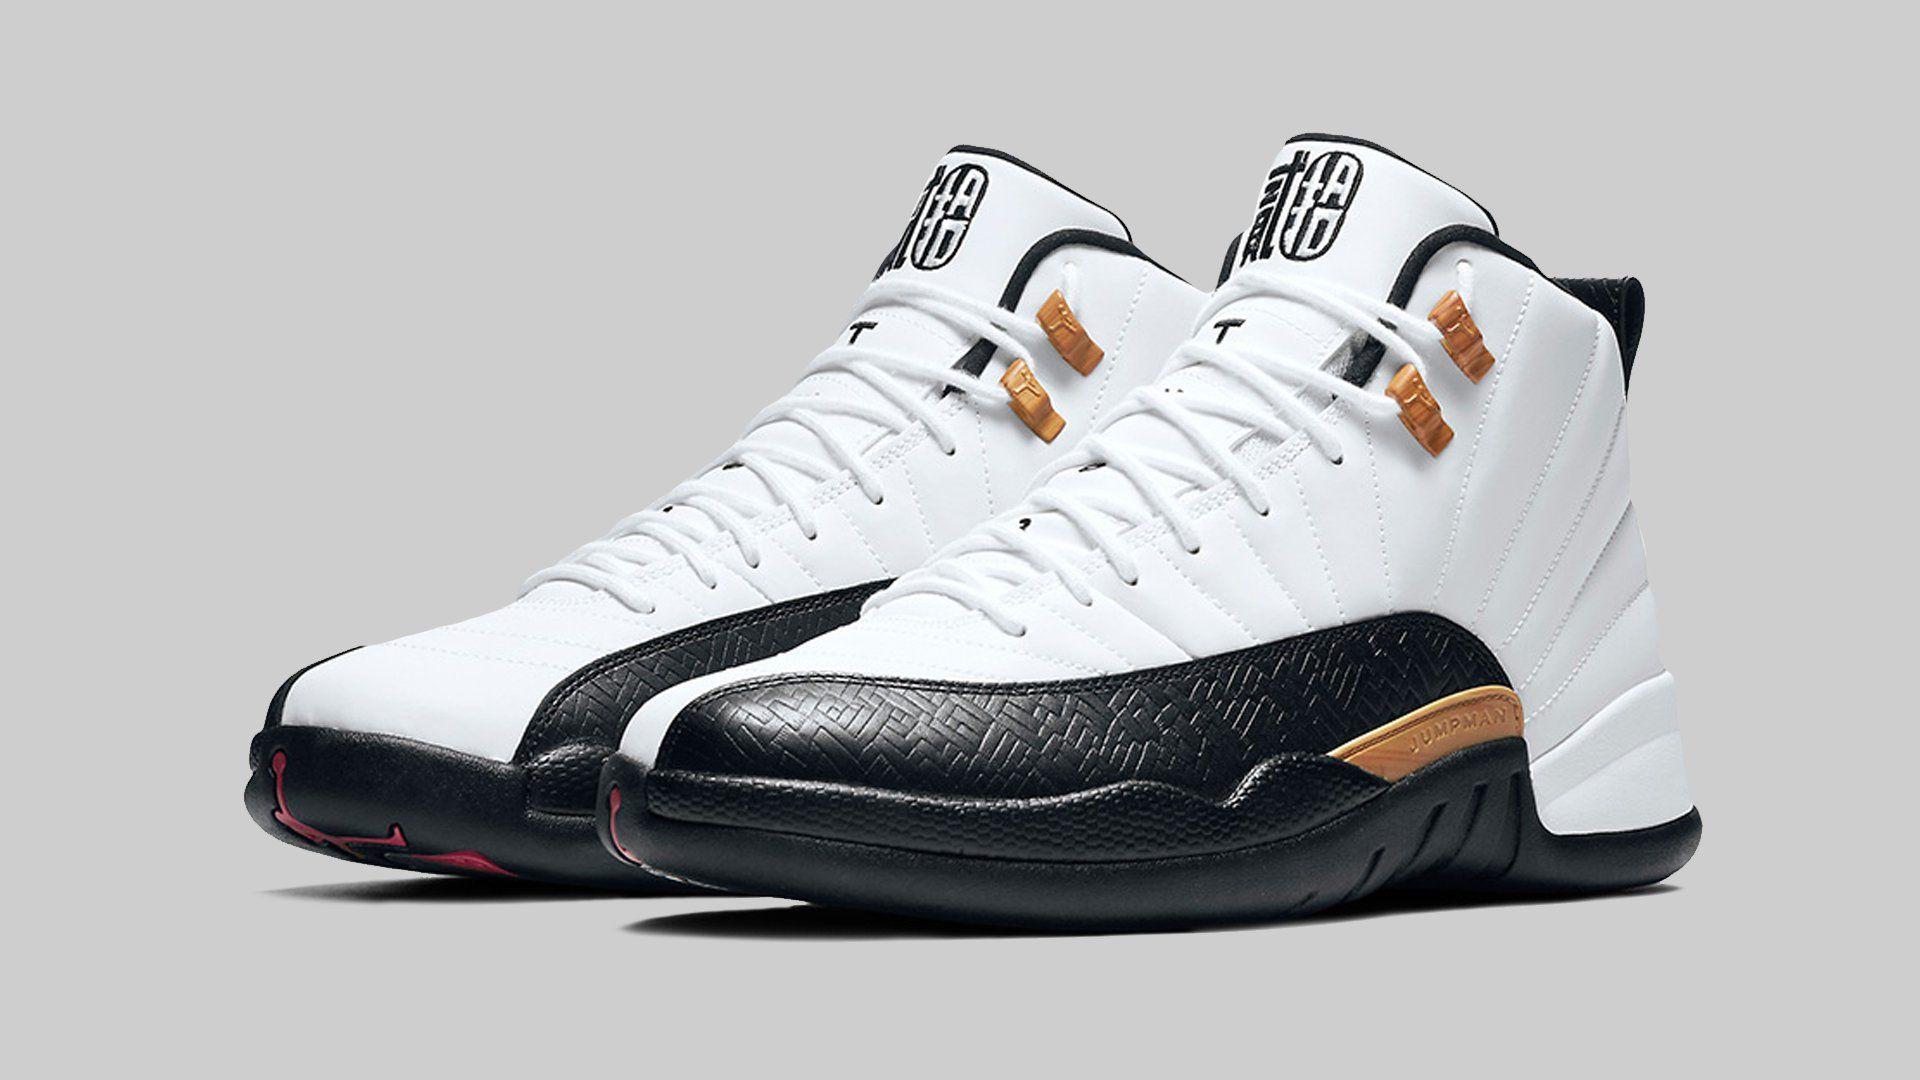 finest selection efb90 a866f Online Hot Nike Air Jordan 13 Retro Cheap sale Playoffs Black Va